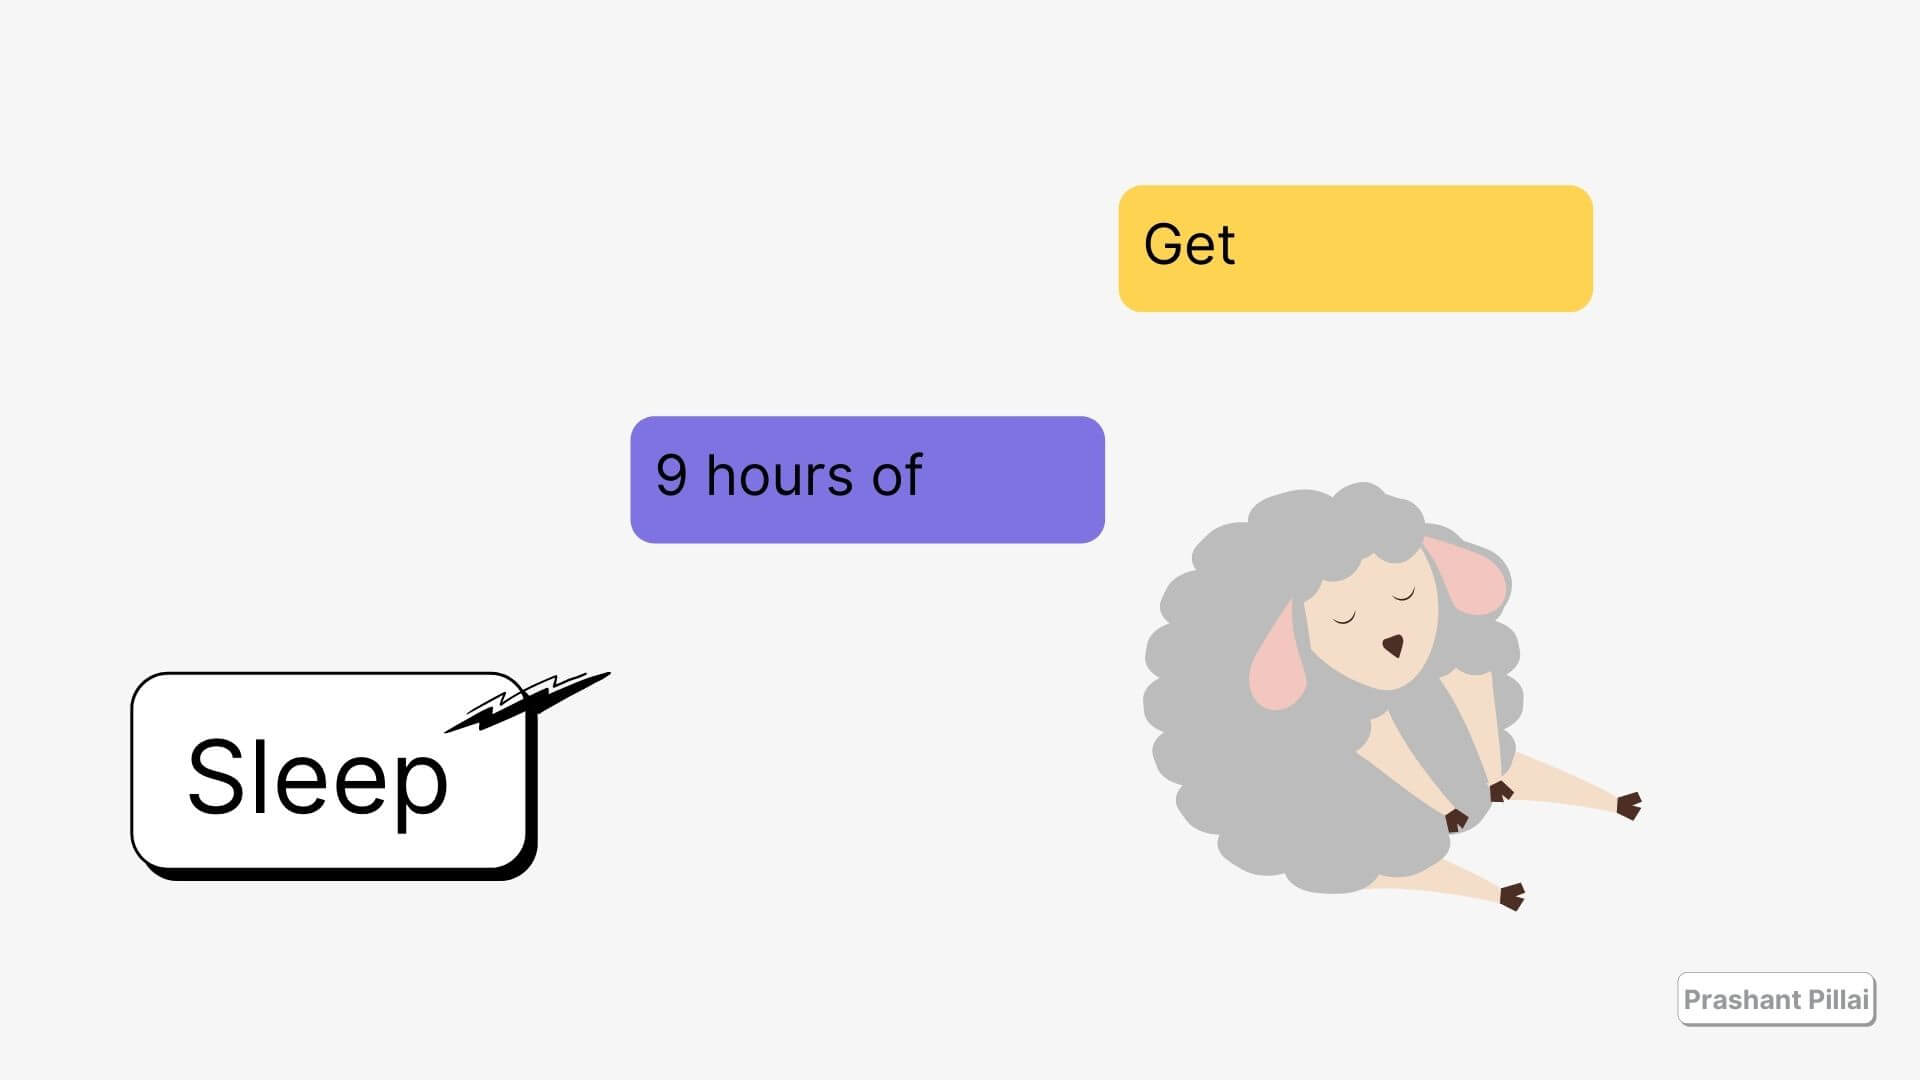 9 hours of sleep illustrations